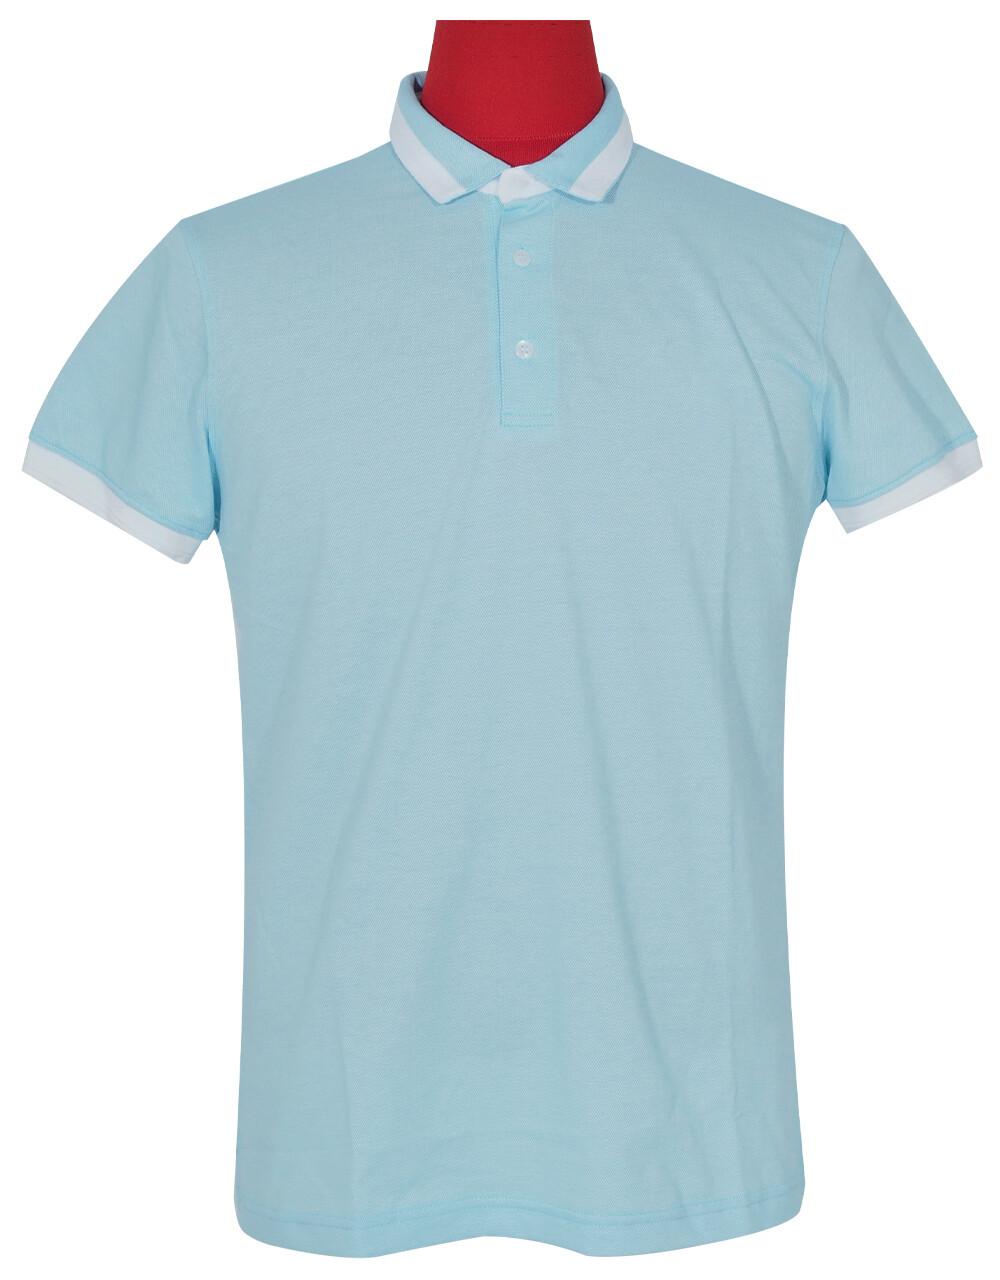 Polo Shirt Fabric Cool Plus Short Sleeve Sky Blue Polo Shirt.